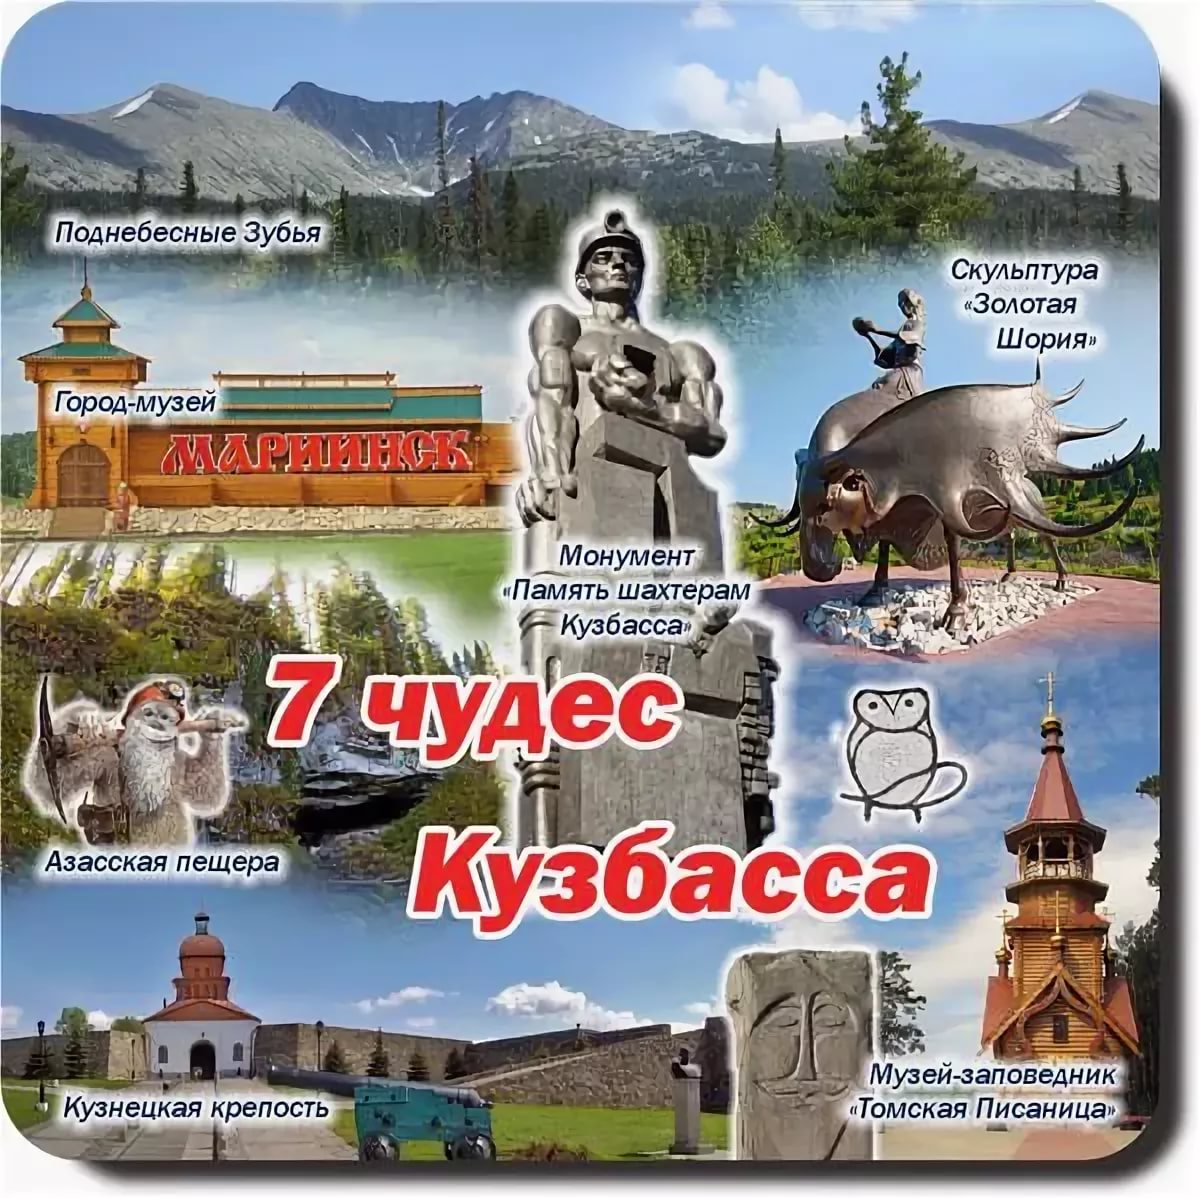 https://ds05.infourok.ru/uploads/ex/0cf3/000e032a-34725dce/hello_html_m19e88505.jpg